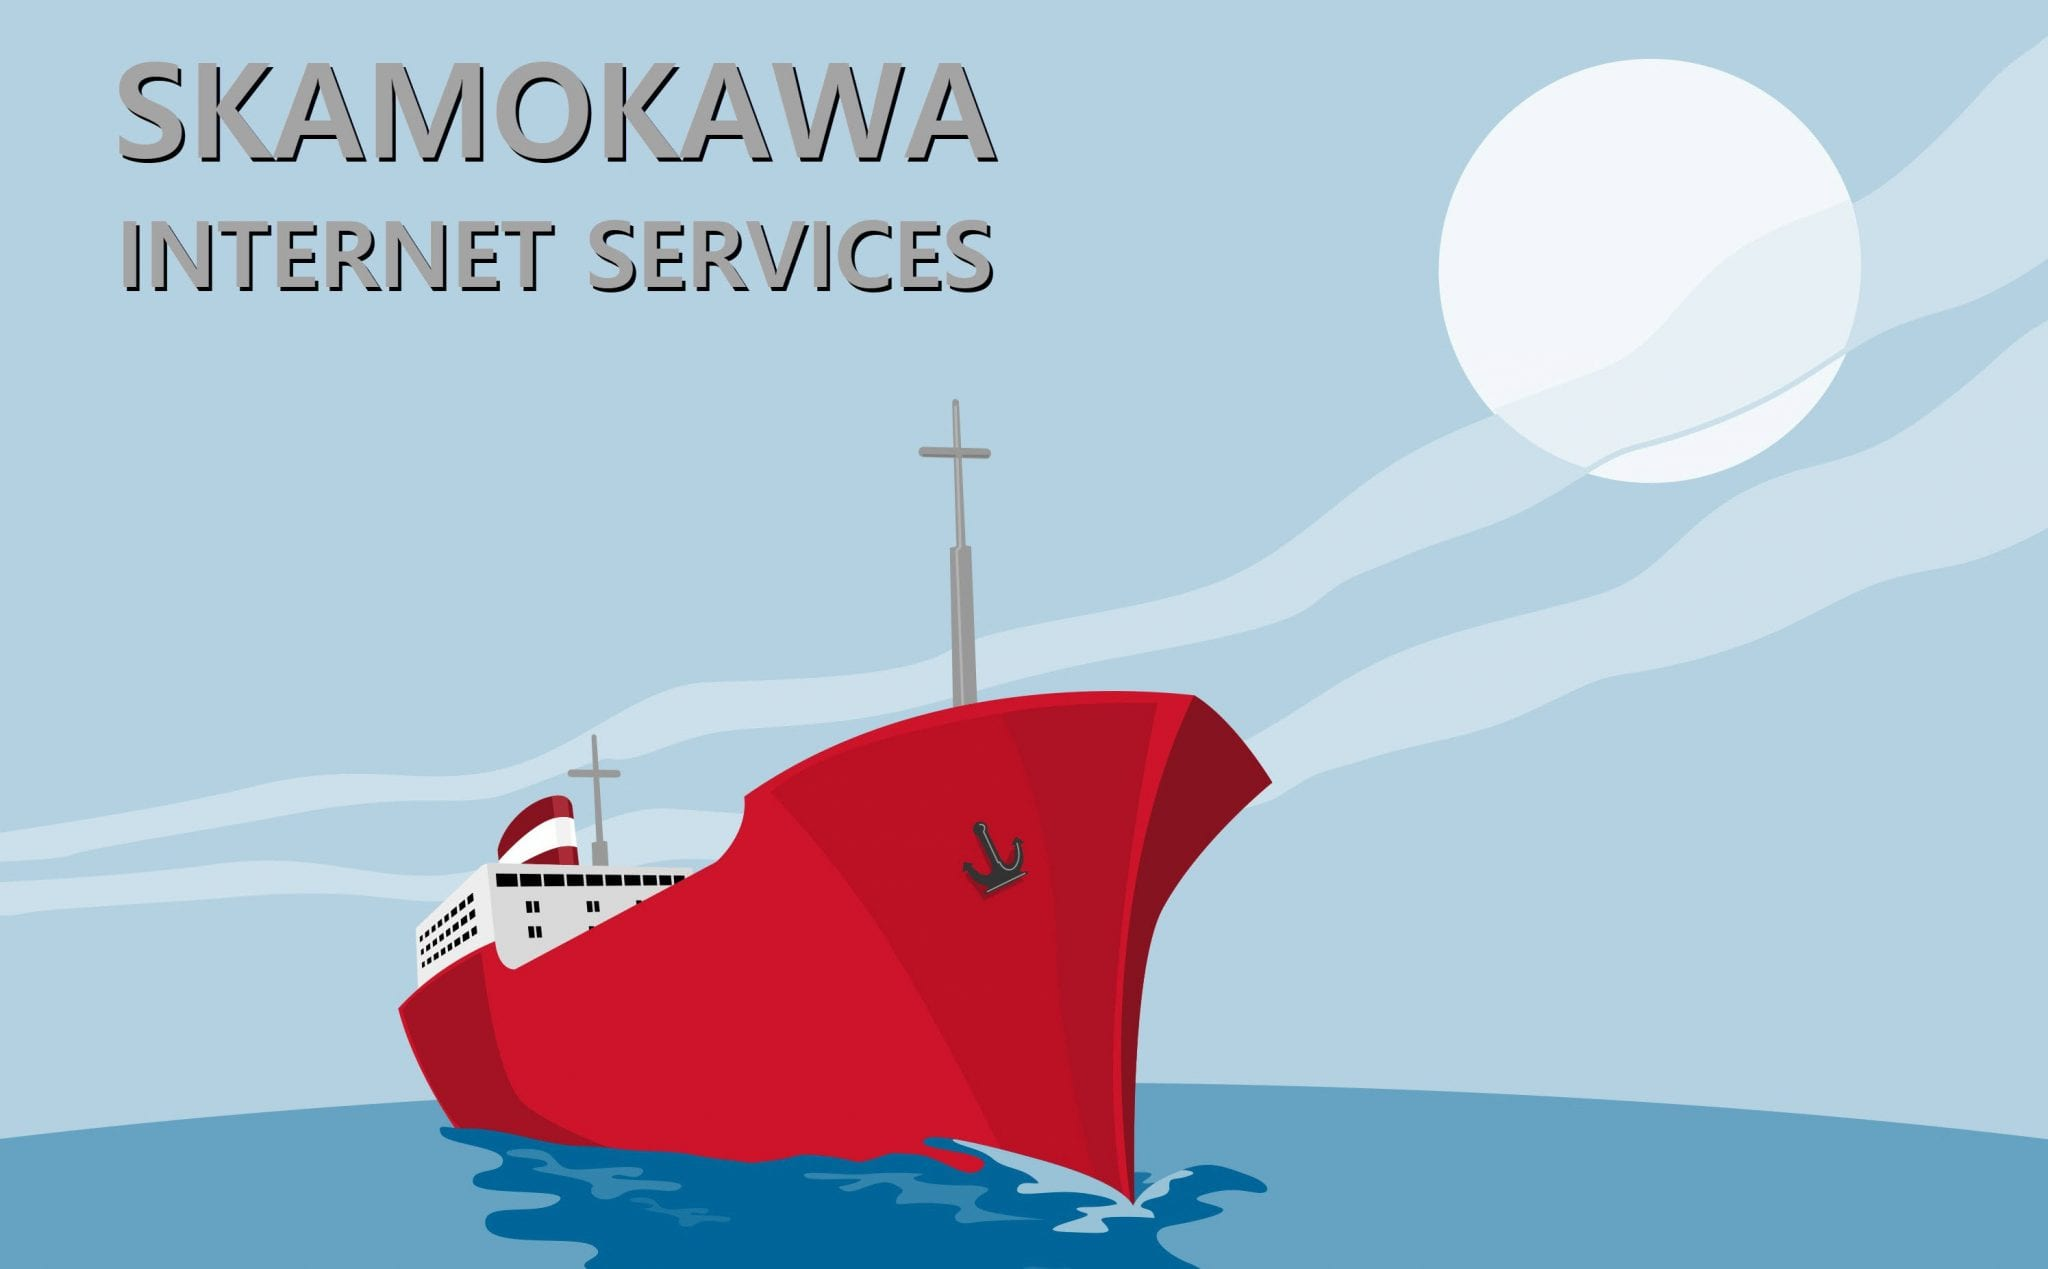 Skamokawa Internet Services